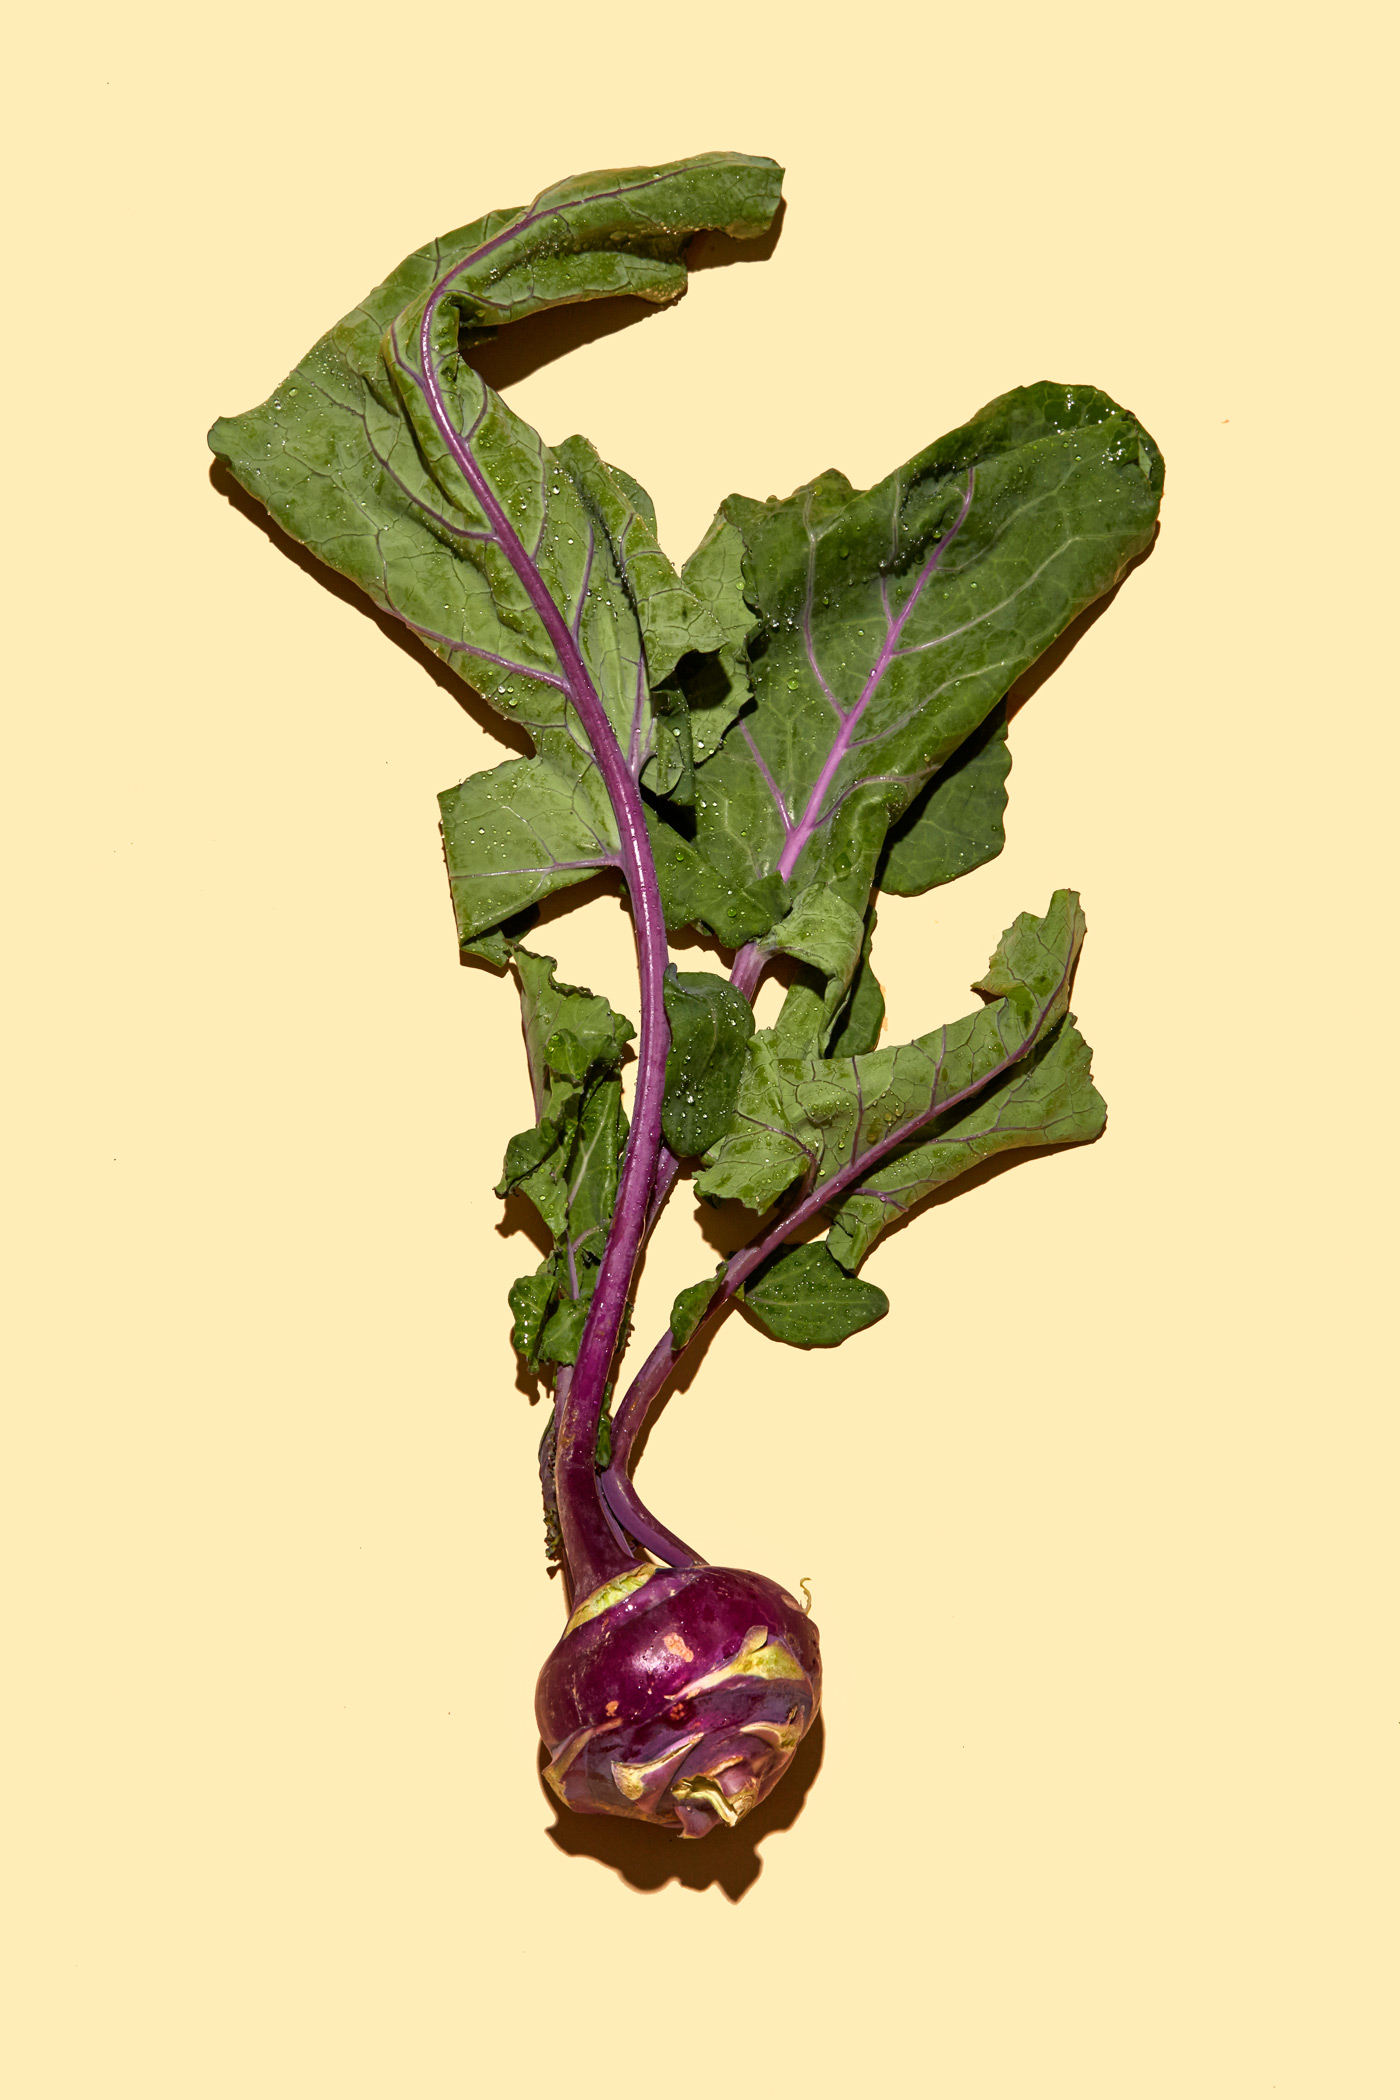 healthiest foods, health food, diet, nutrition, time.com stock, kohlrabi